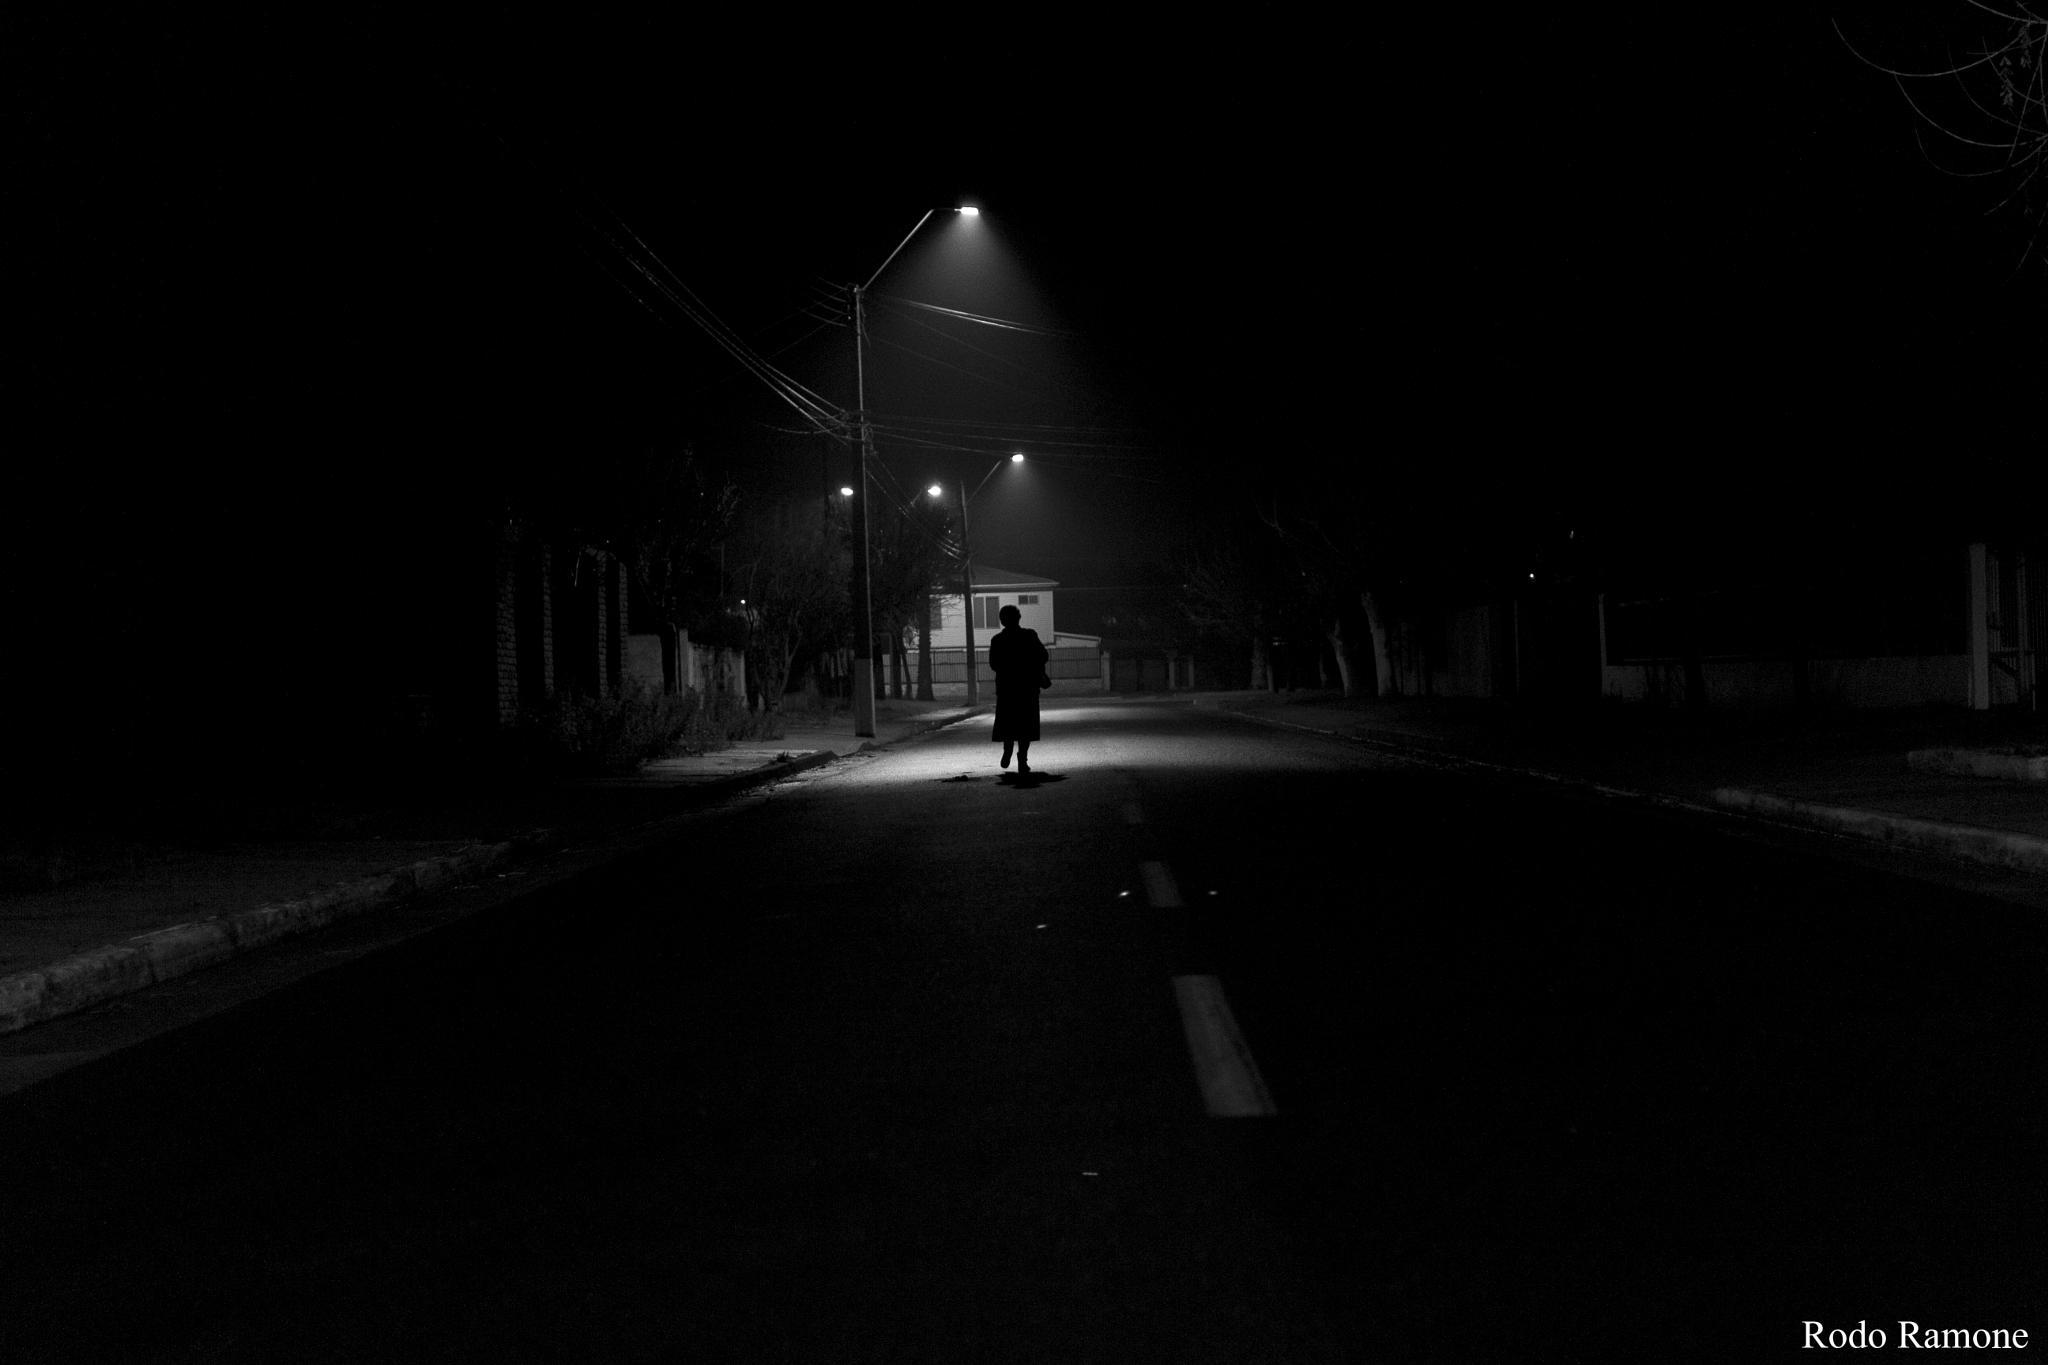 into the dark by Rodoramone